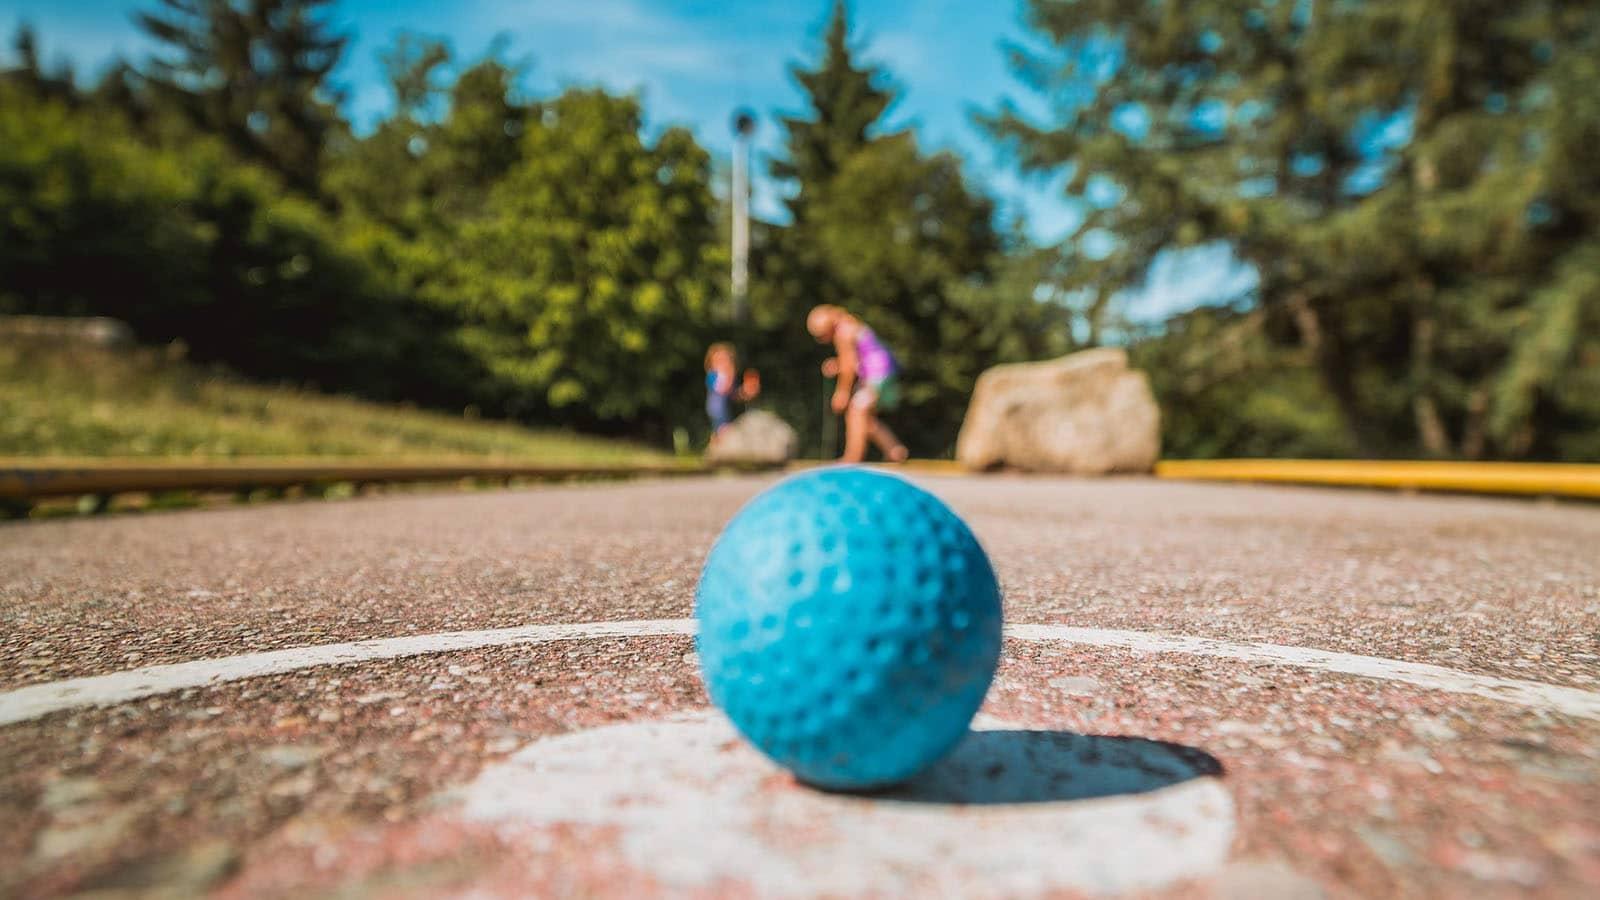 Activités sports et nature en vendee: minigolf